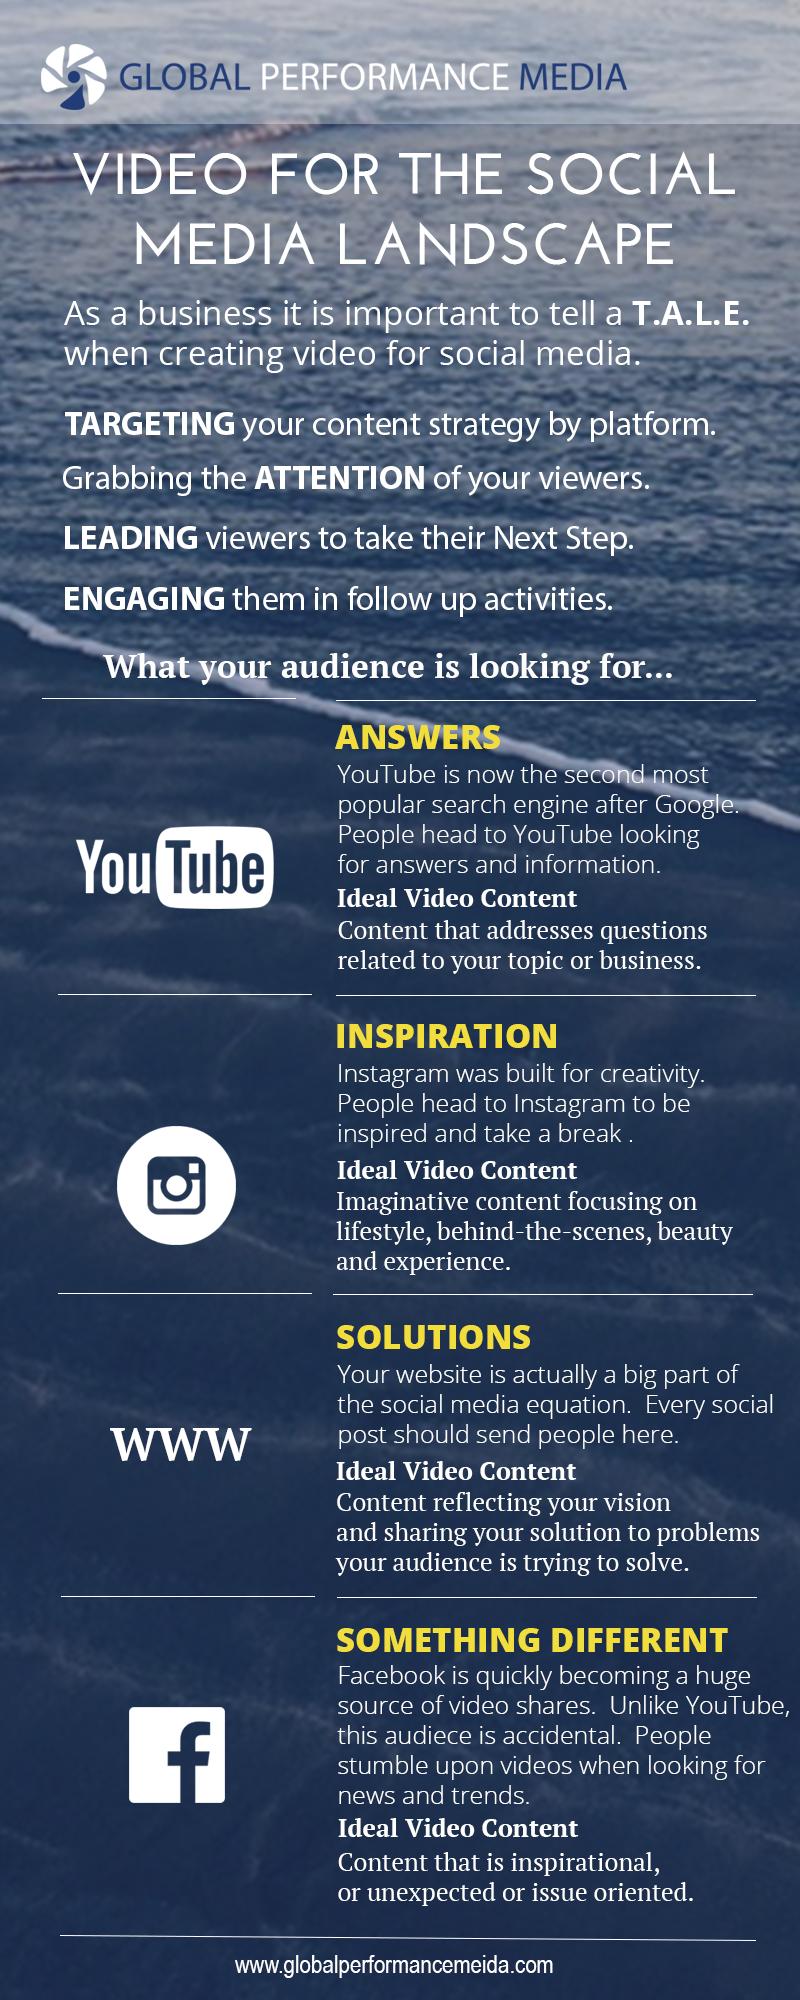 VideofortheSocialMediaLandscape